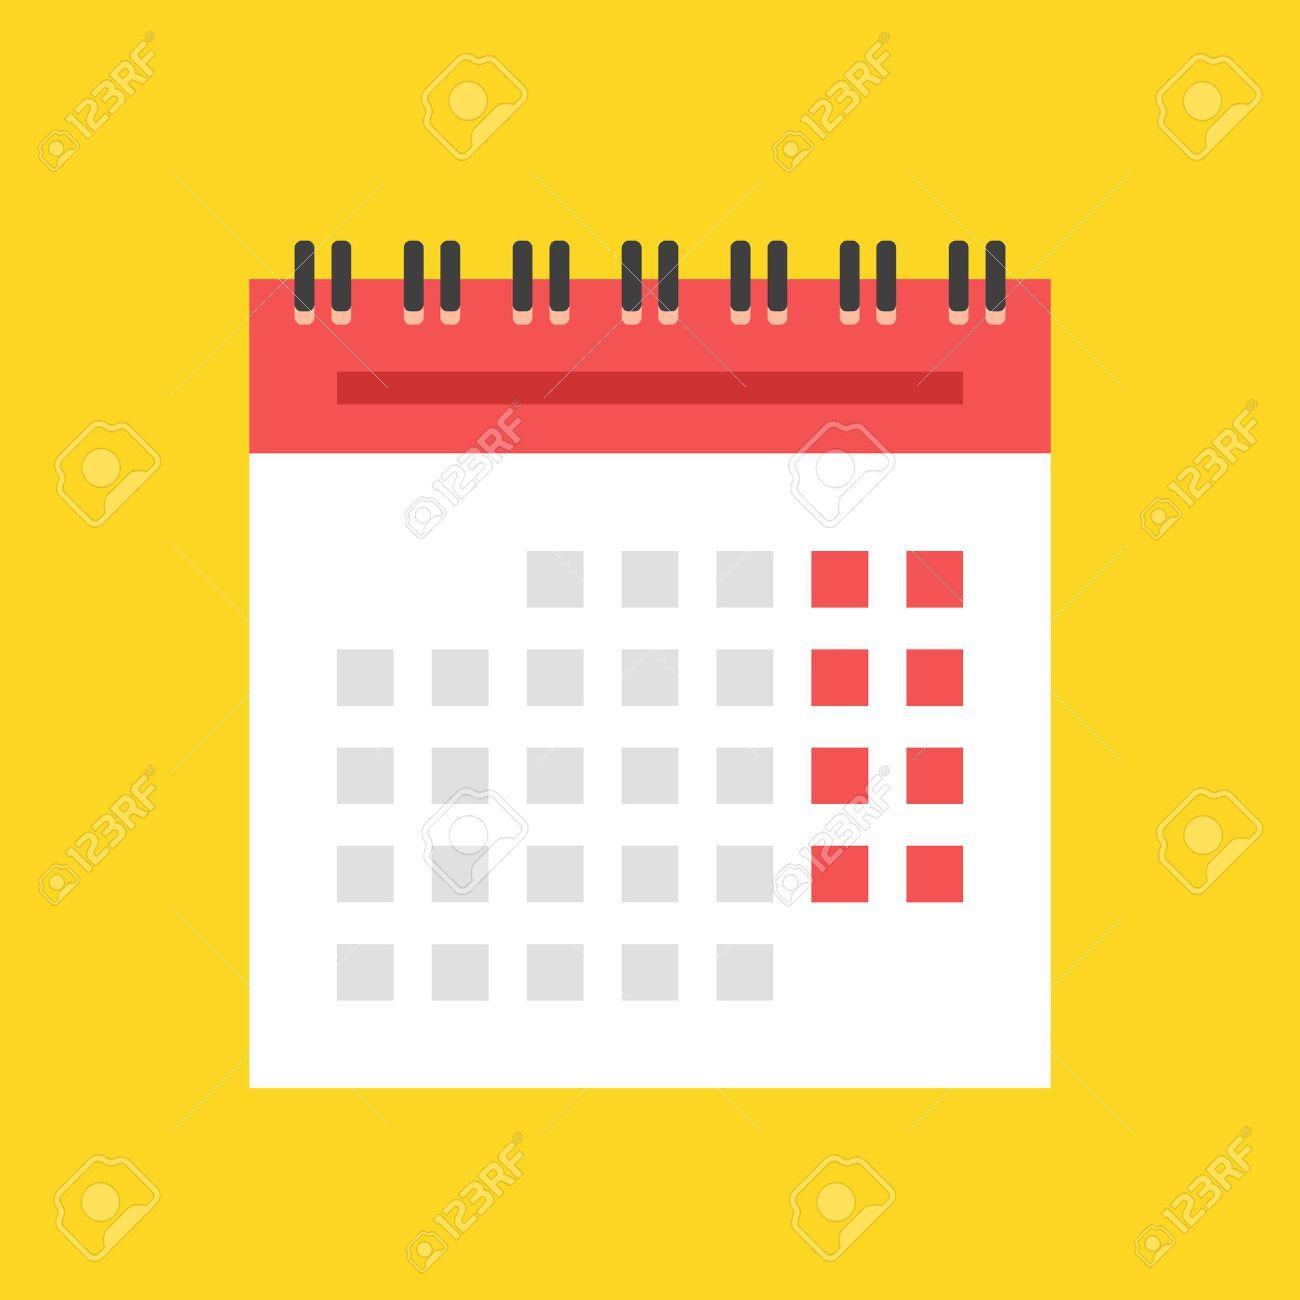 Calendario Vectores.Icono Del Calendario Plana Pared Espiral Ilustracion Vector Calendario